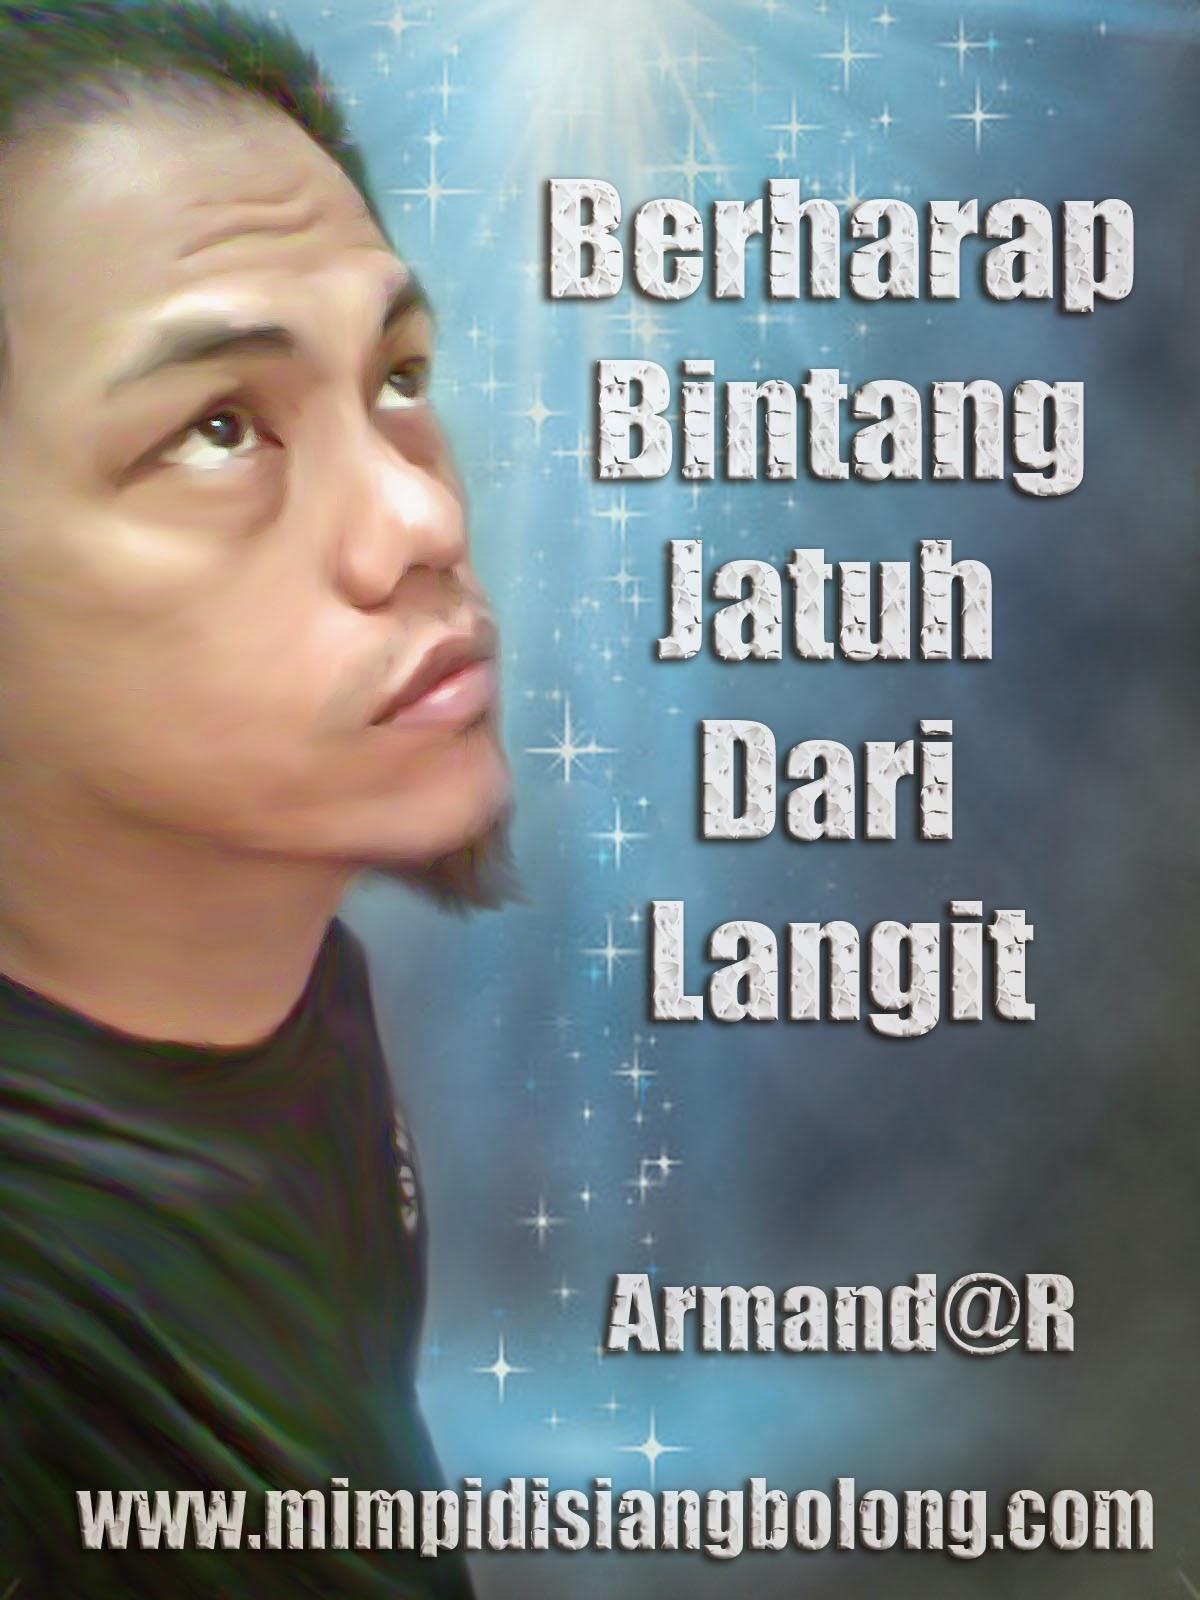 ARMAND@R